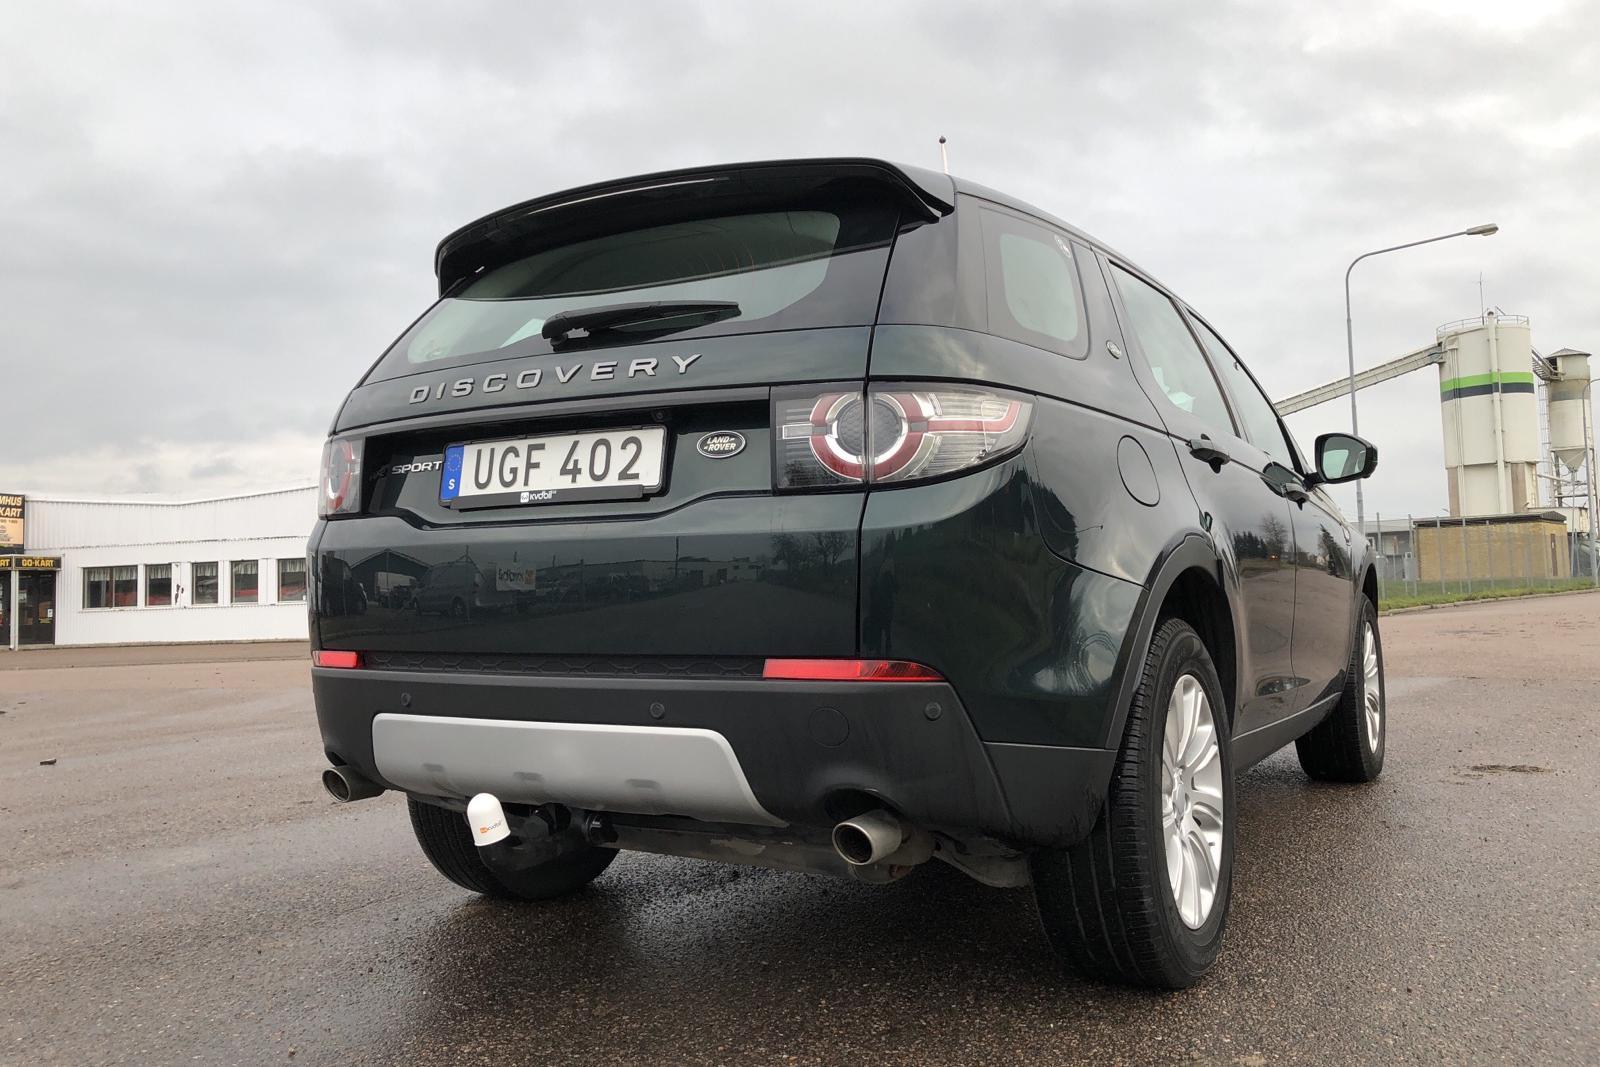 Land Rover Discovery Sport 2.0 TD4 AWD (180hk) - 6 628 mil - Automat - grön - 2016